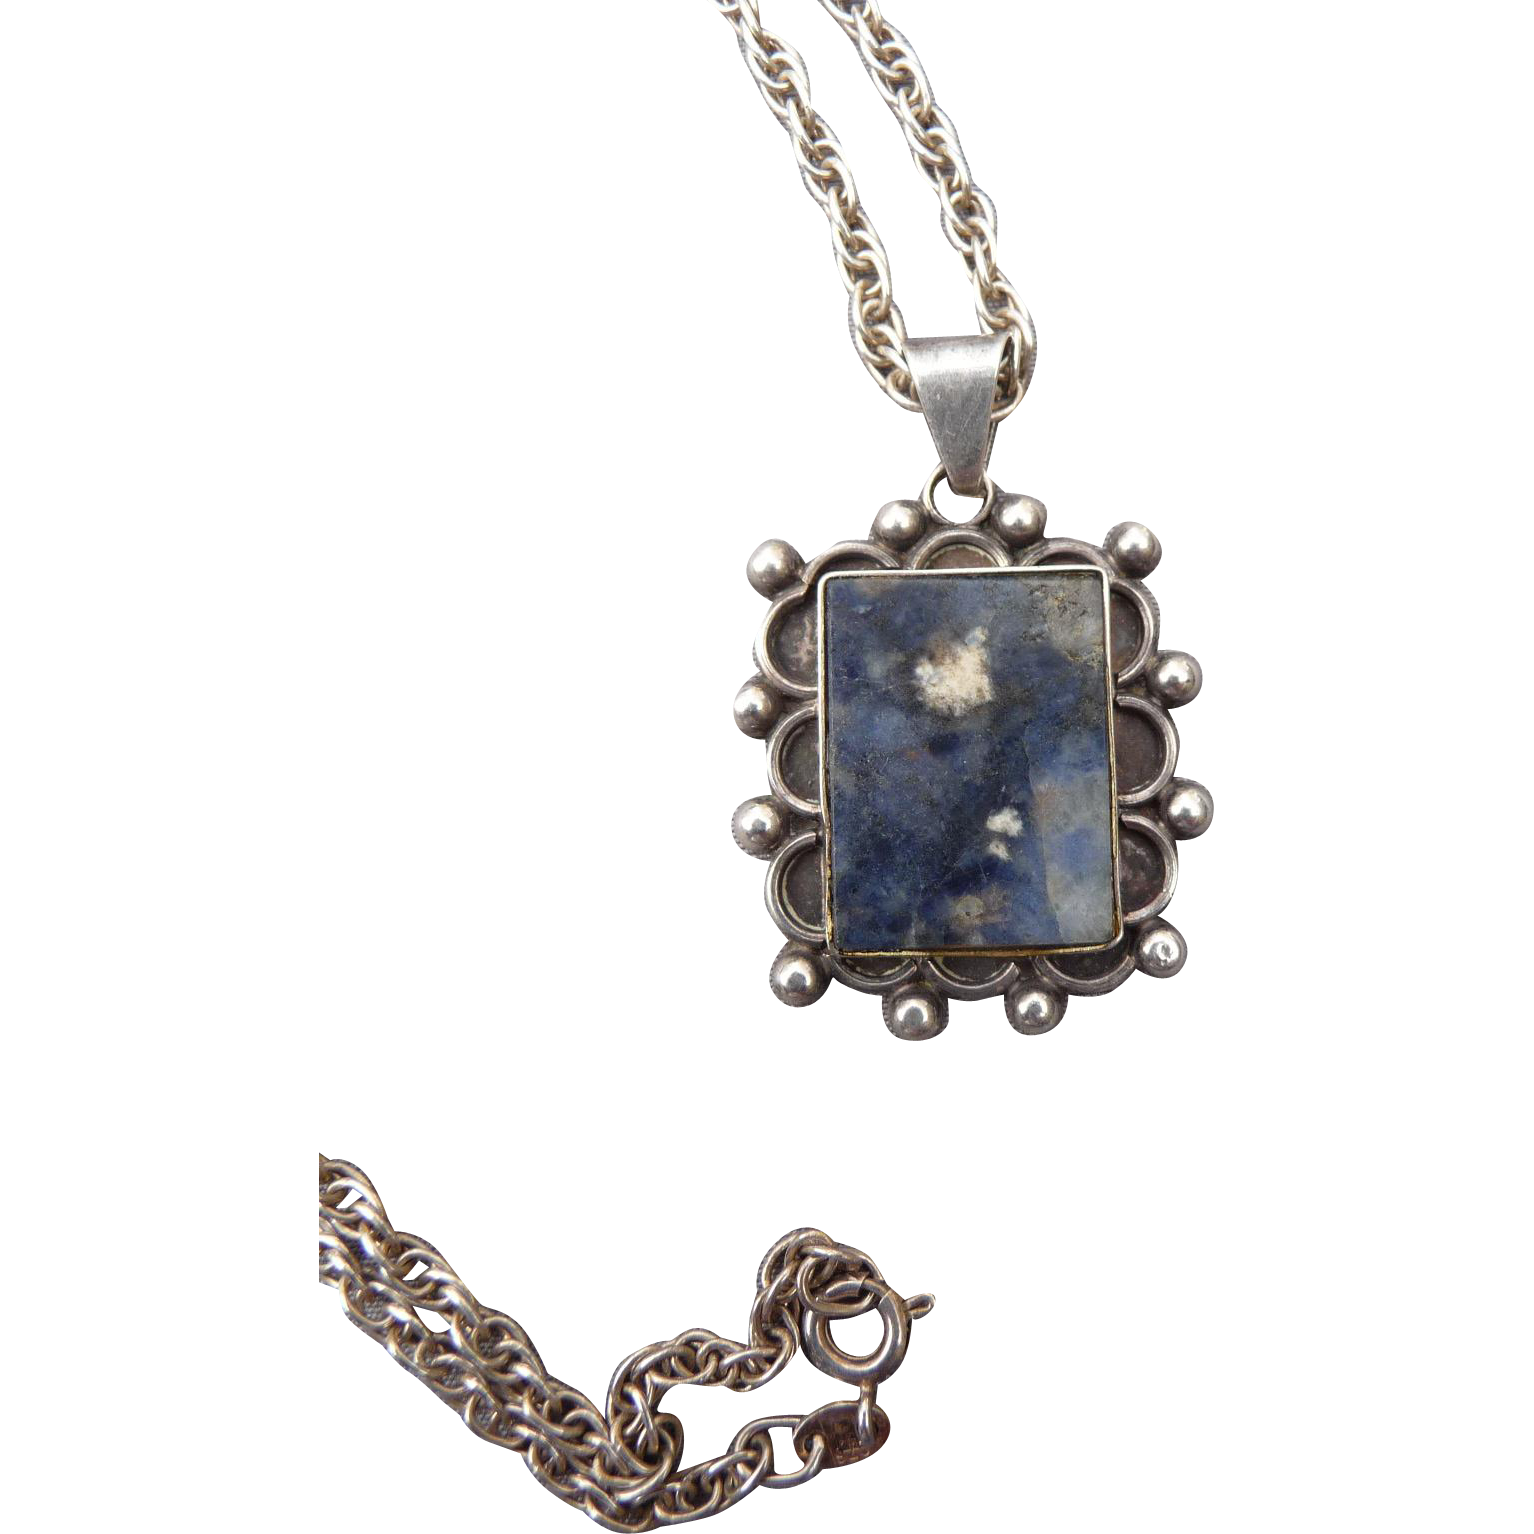 Vintage Silver Mexican Agate Pendant